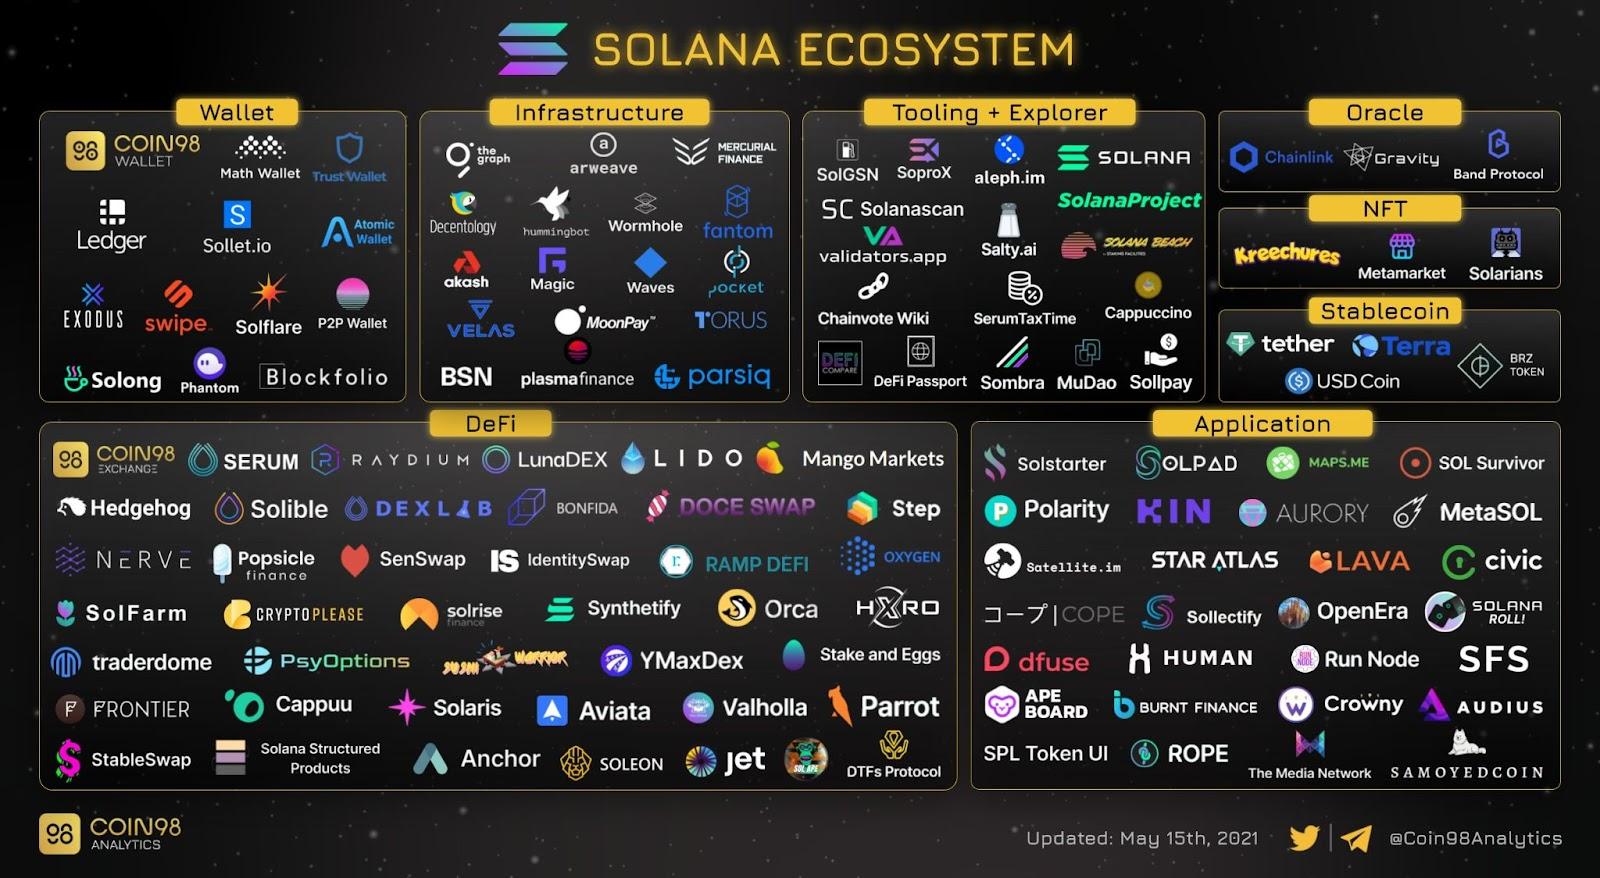 Solana Ecosystem